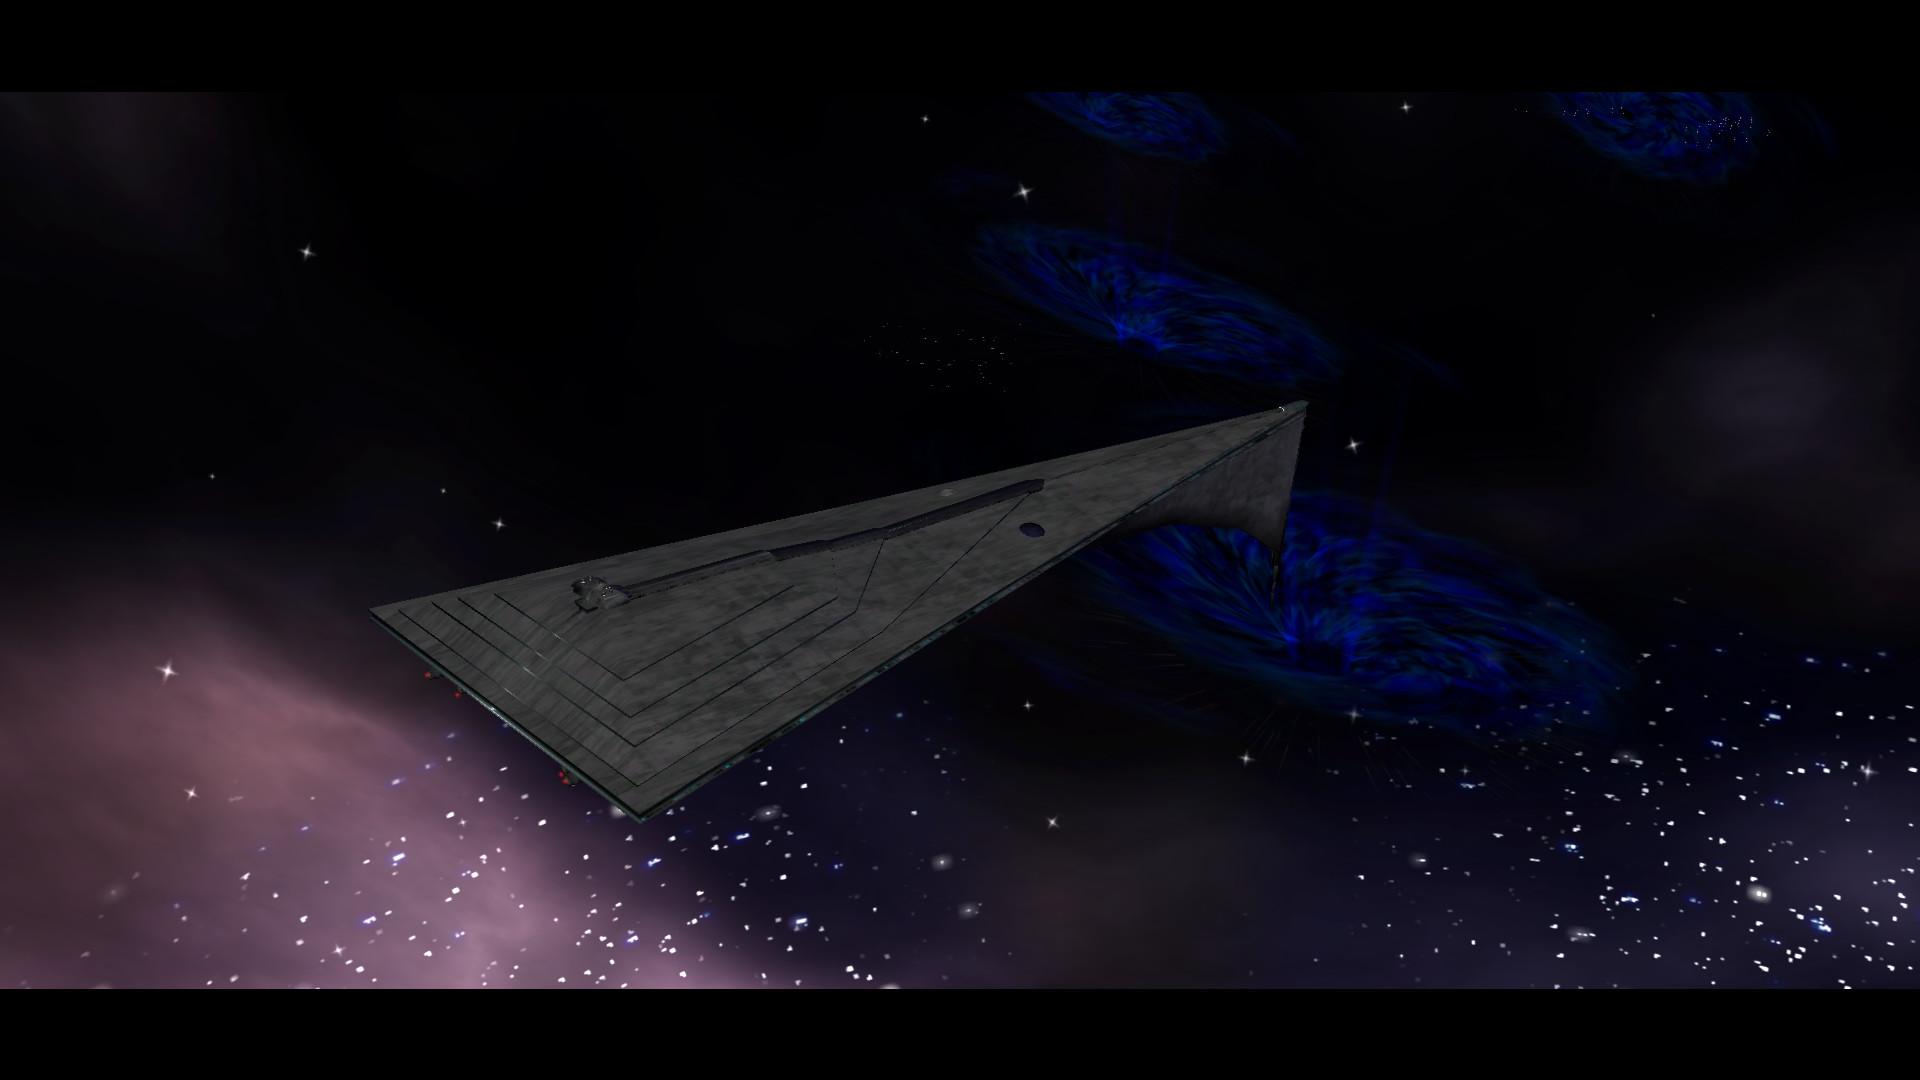 Eclipse-class Super Star Destroyer   Star Wars: The Lost Saga Wiki   FANDOM  powered by Wikia